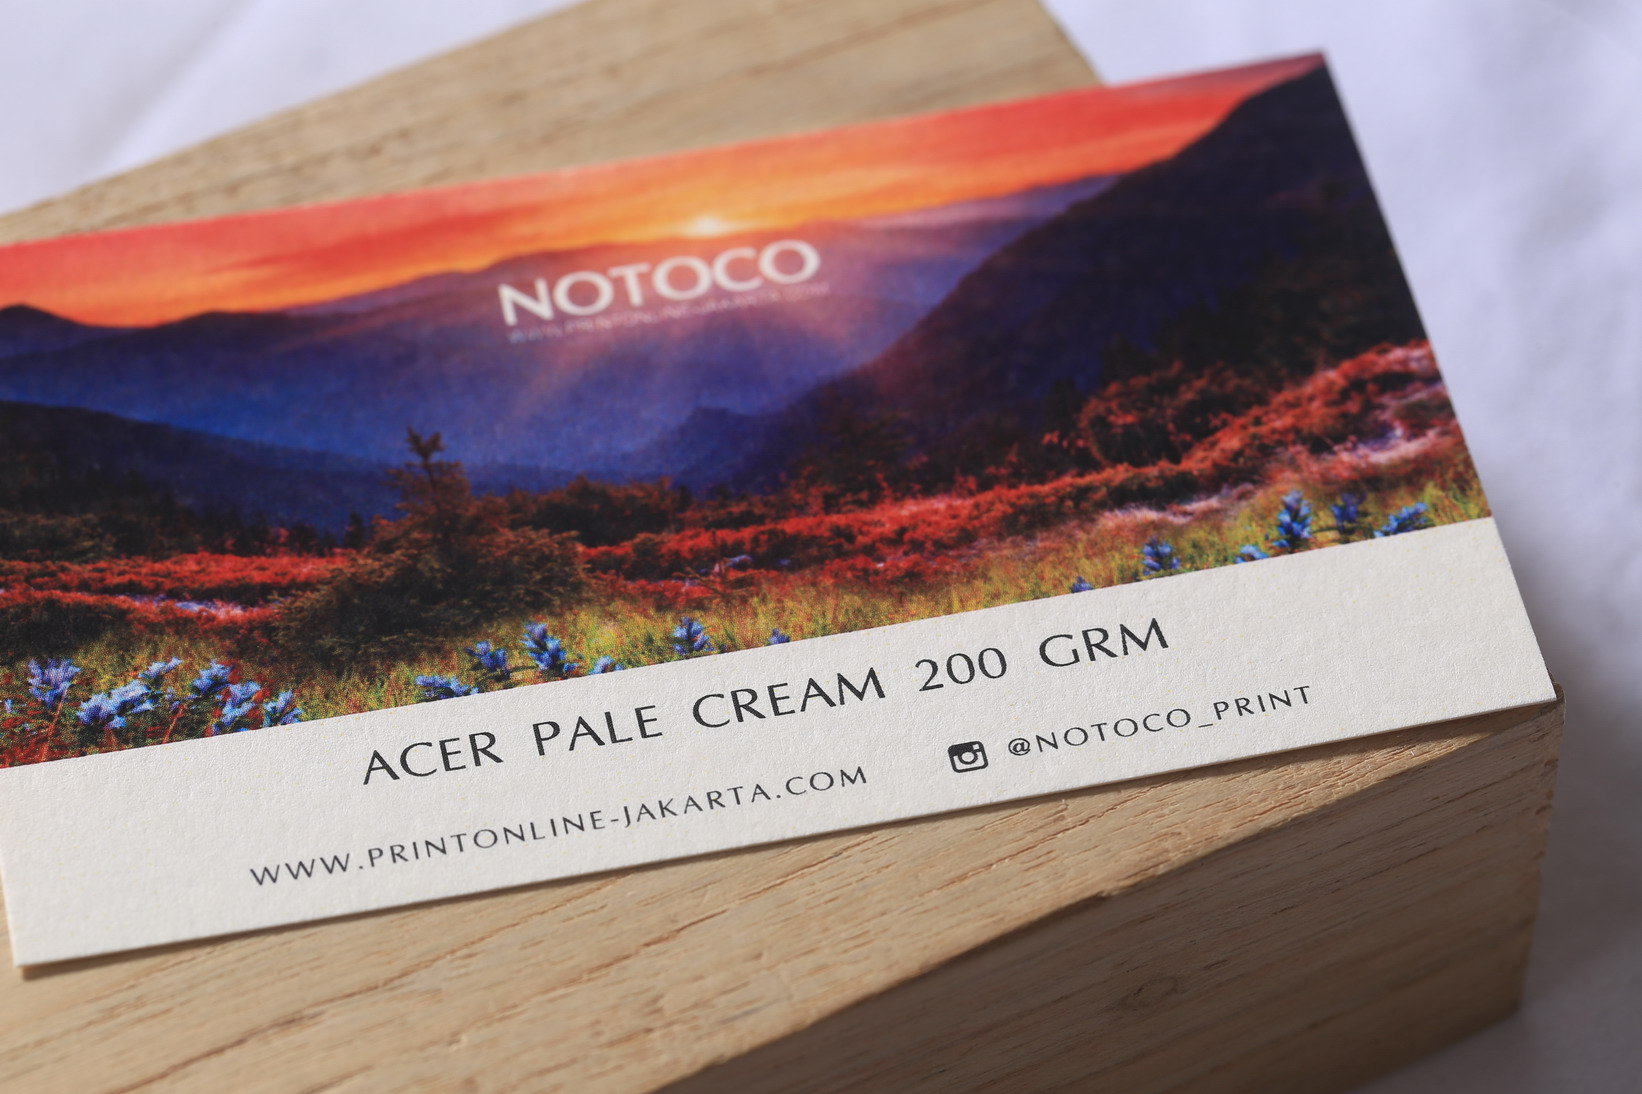 Acer Pale 200 grm